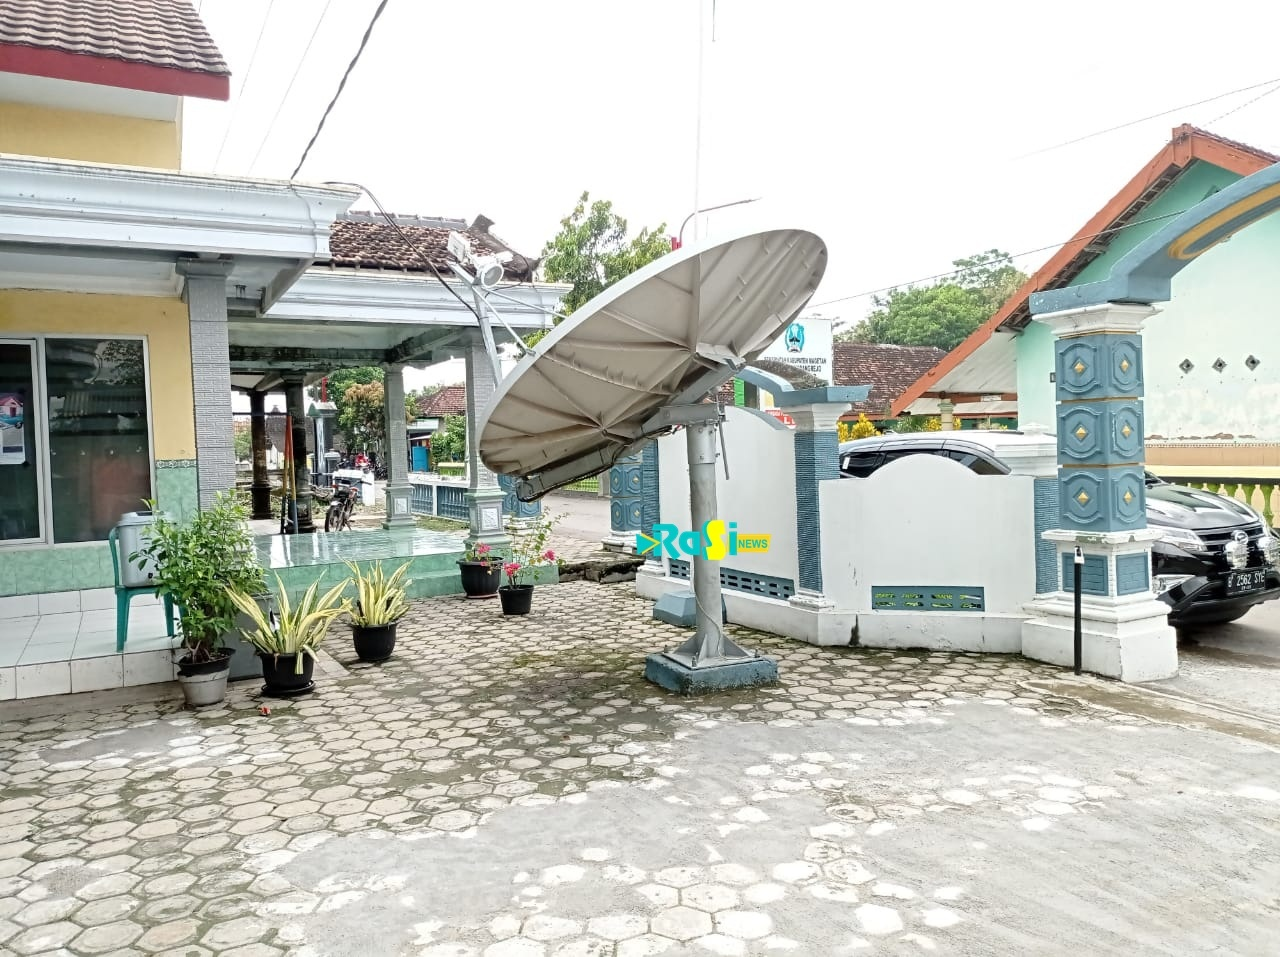 Wujudkan Desa Cyber, Pemdes Gebyog Akan Hidupkan Parabola Bantuan Kementerian Kominfo Yang Sempat Mangkrak